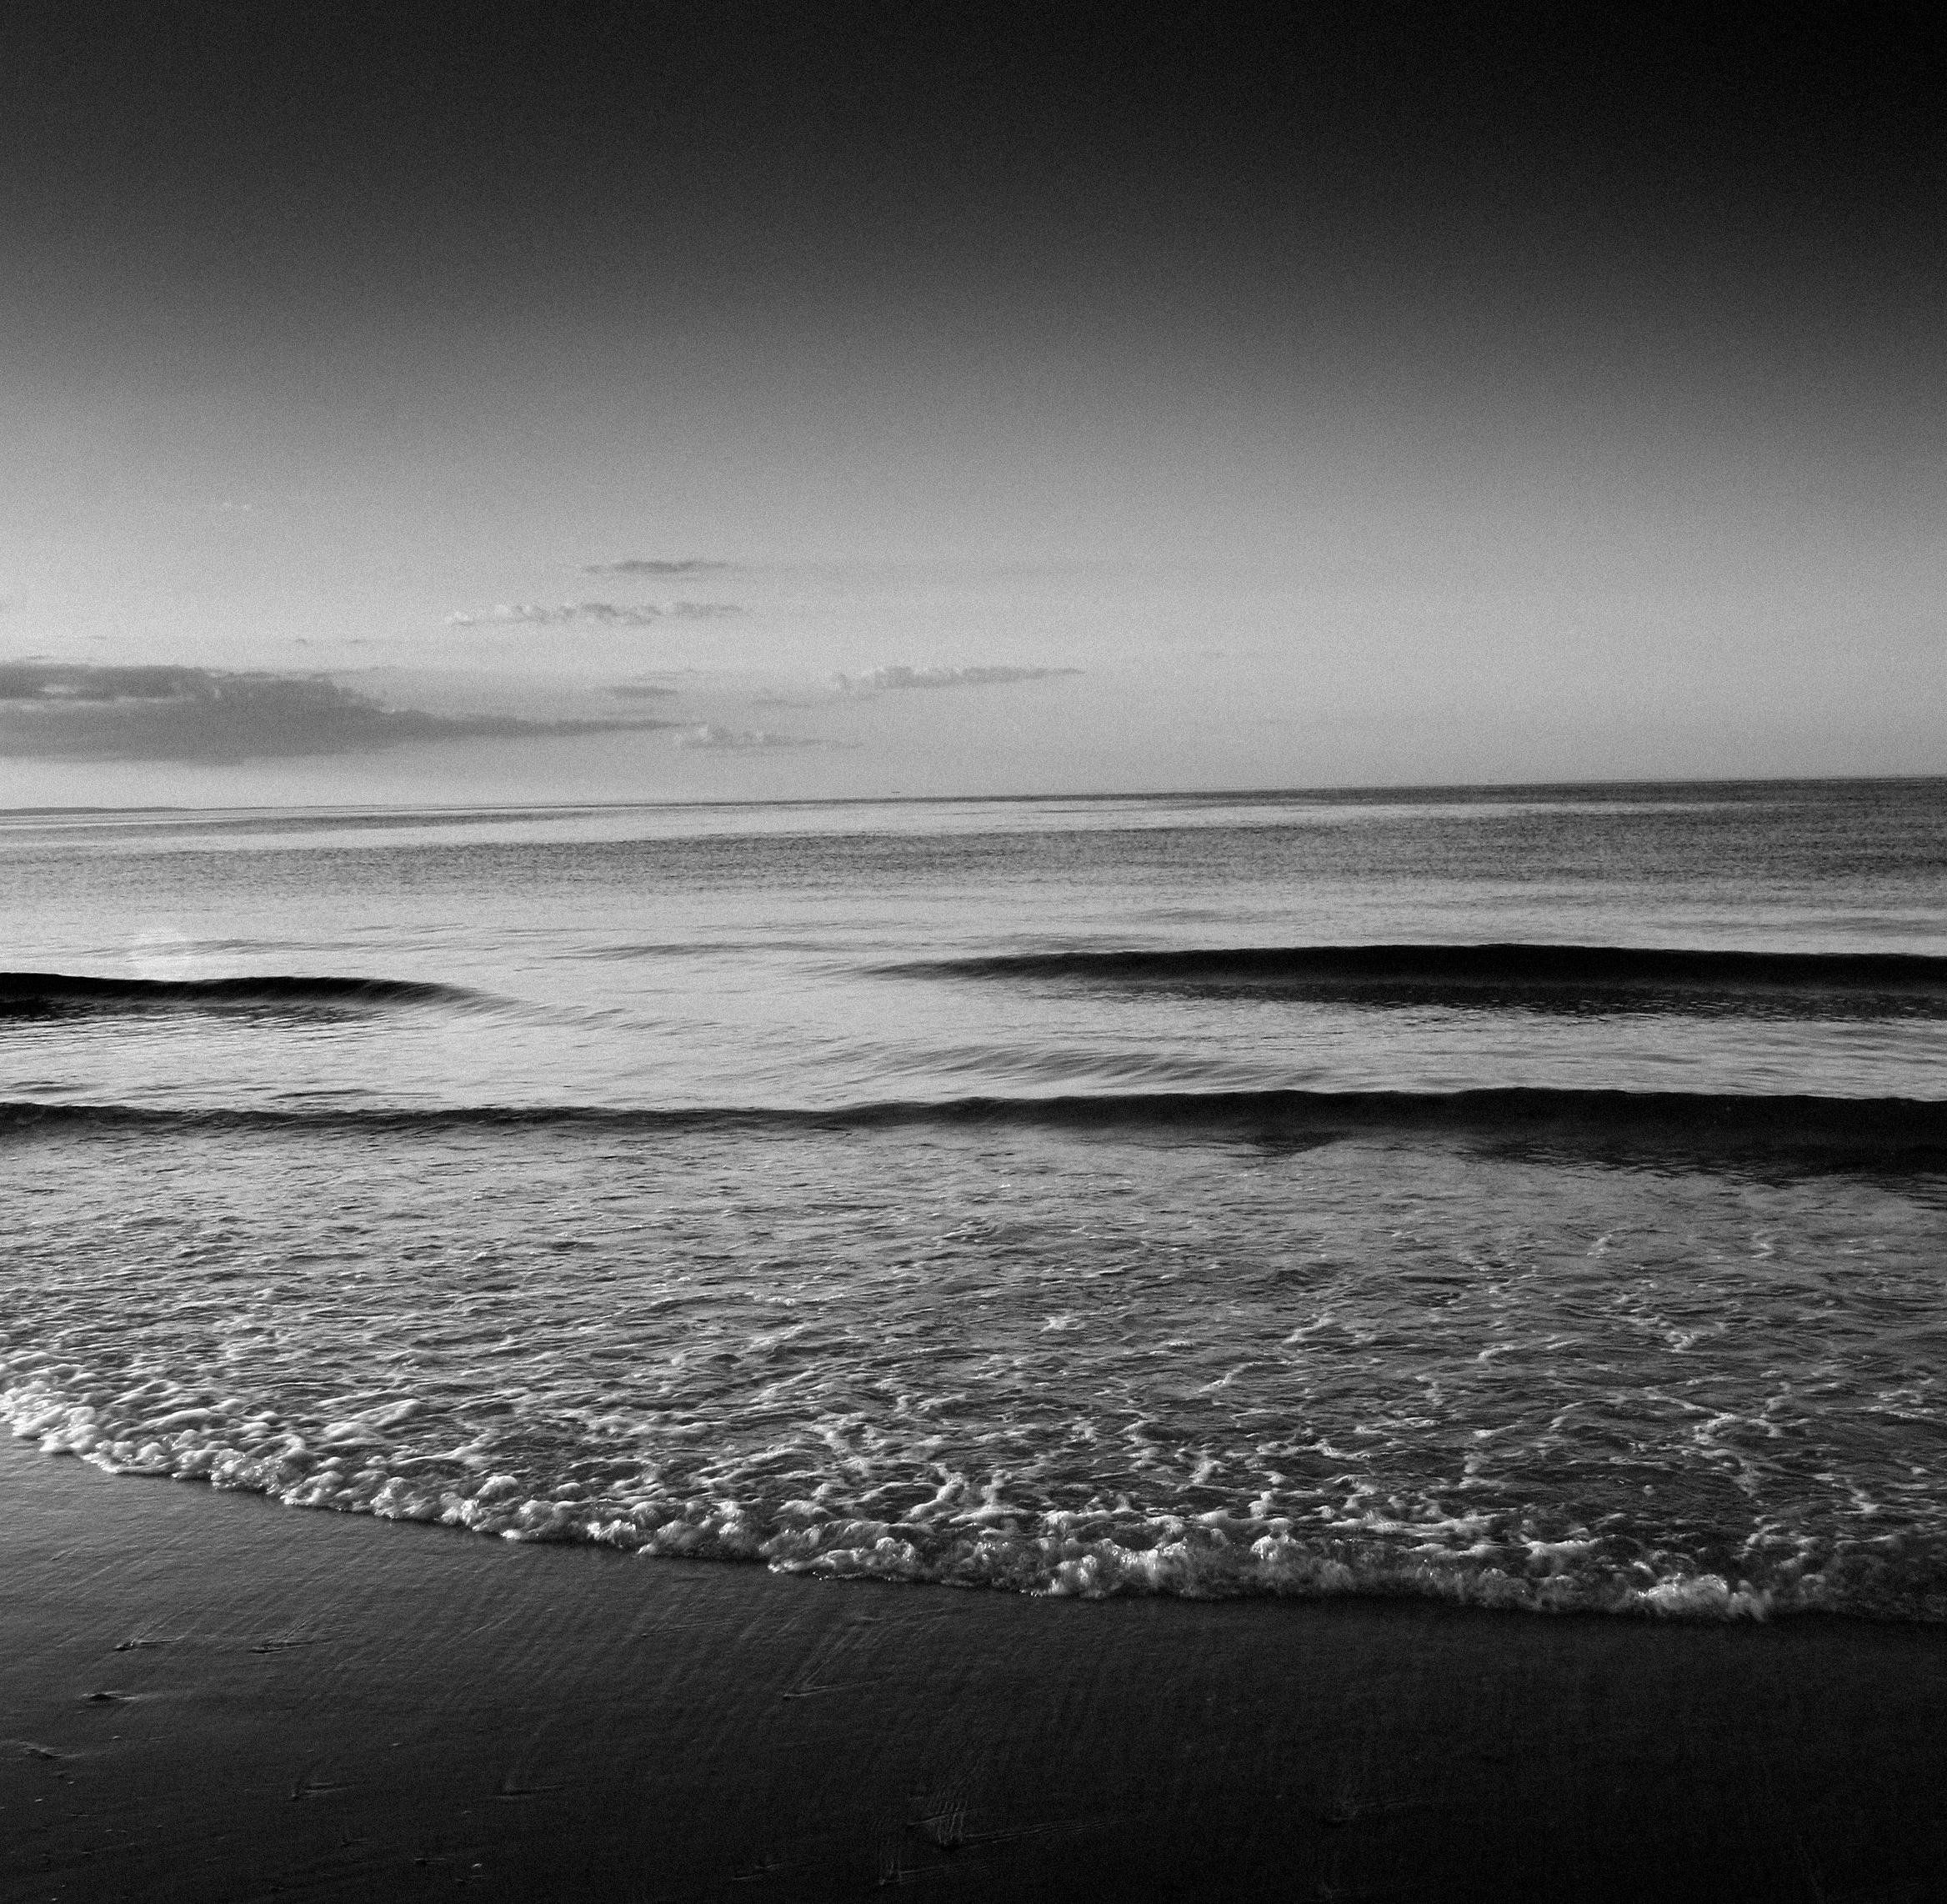 Waves, Cape Cod Ntl Seashore